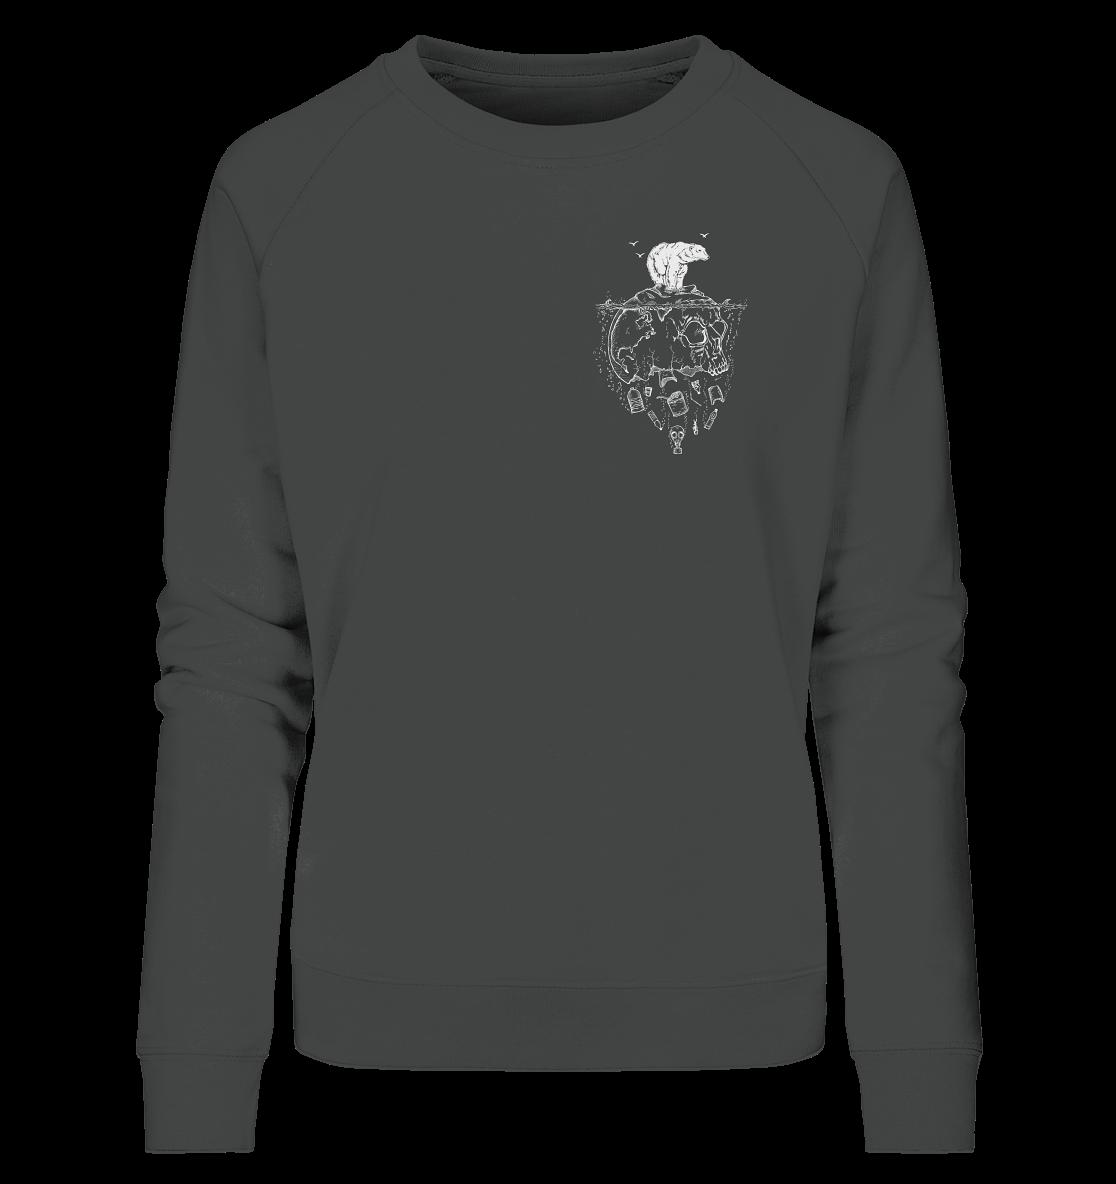 front-ladies-organic-sweatshirt-444545-1116x-16.png